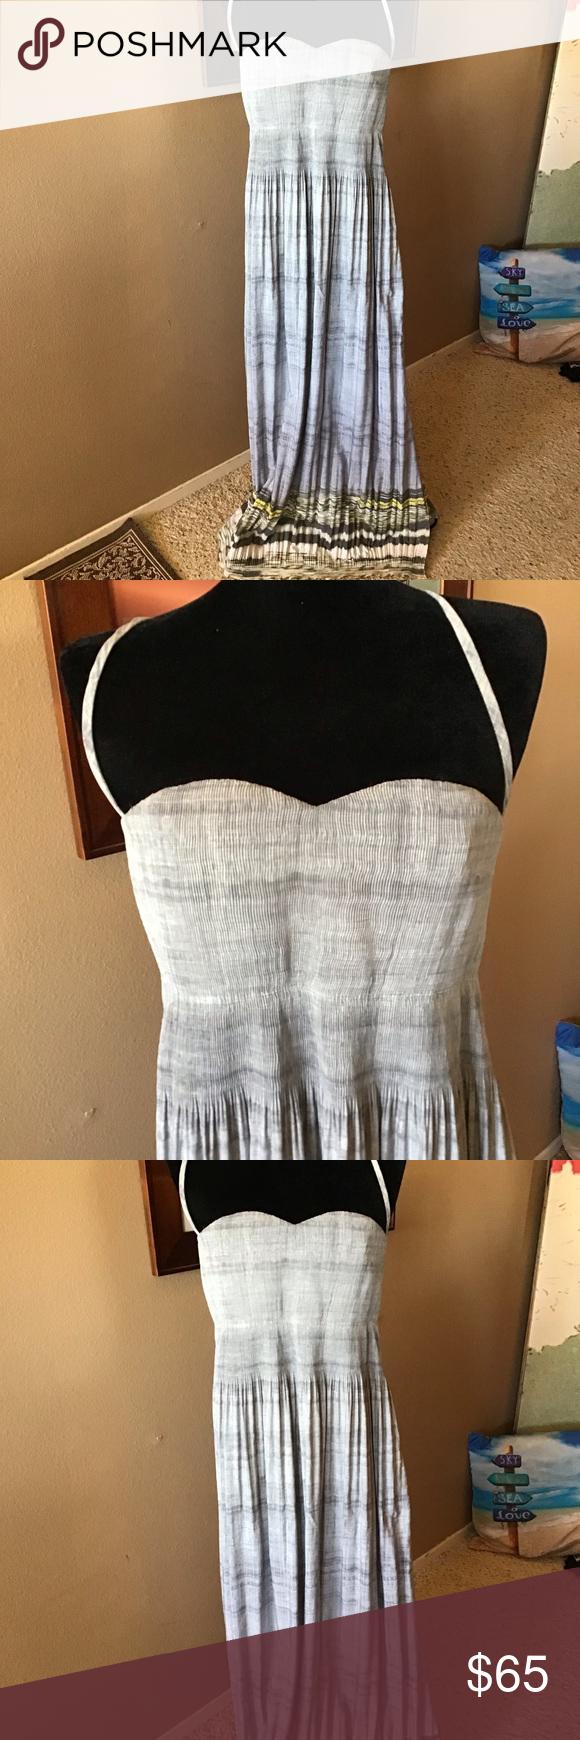 Elie Tahari Maxi Dress Elie Tahari Maxi Dress Elie Tahari Dresses [ 1740 x 580 Pixel ]